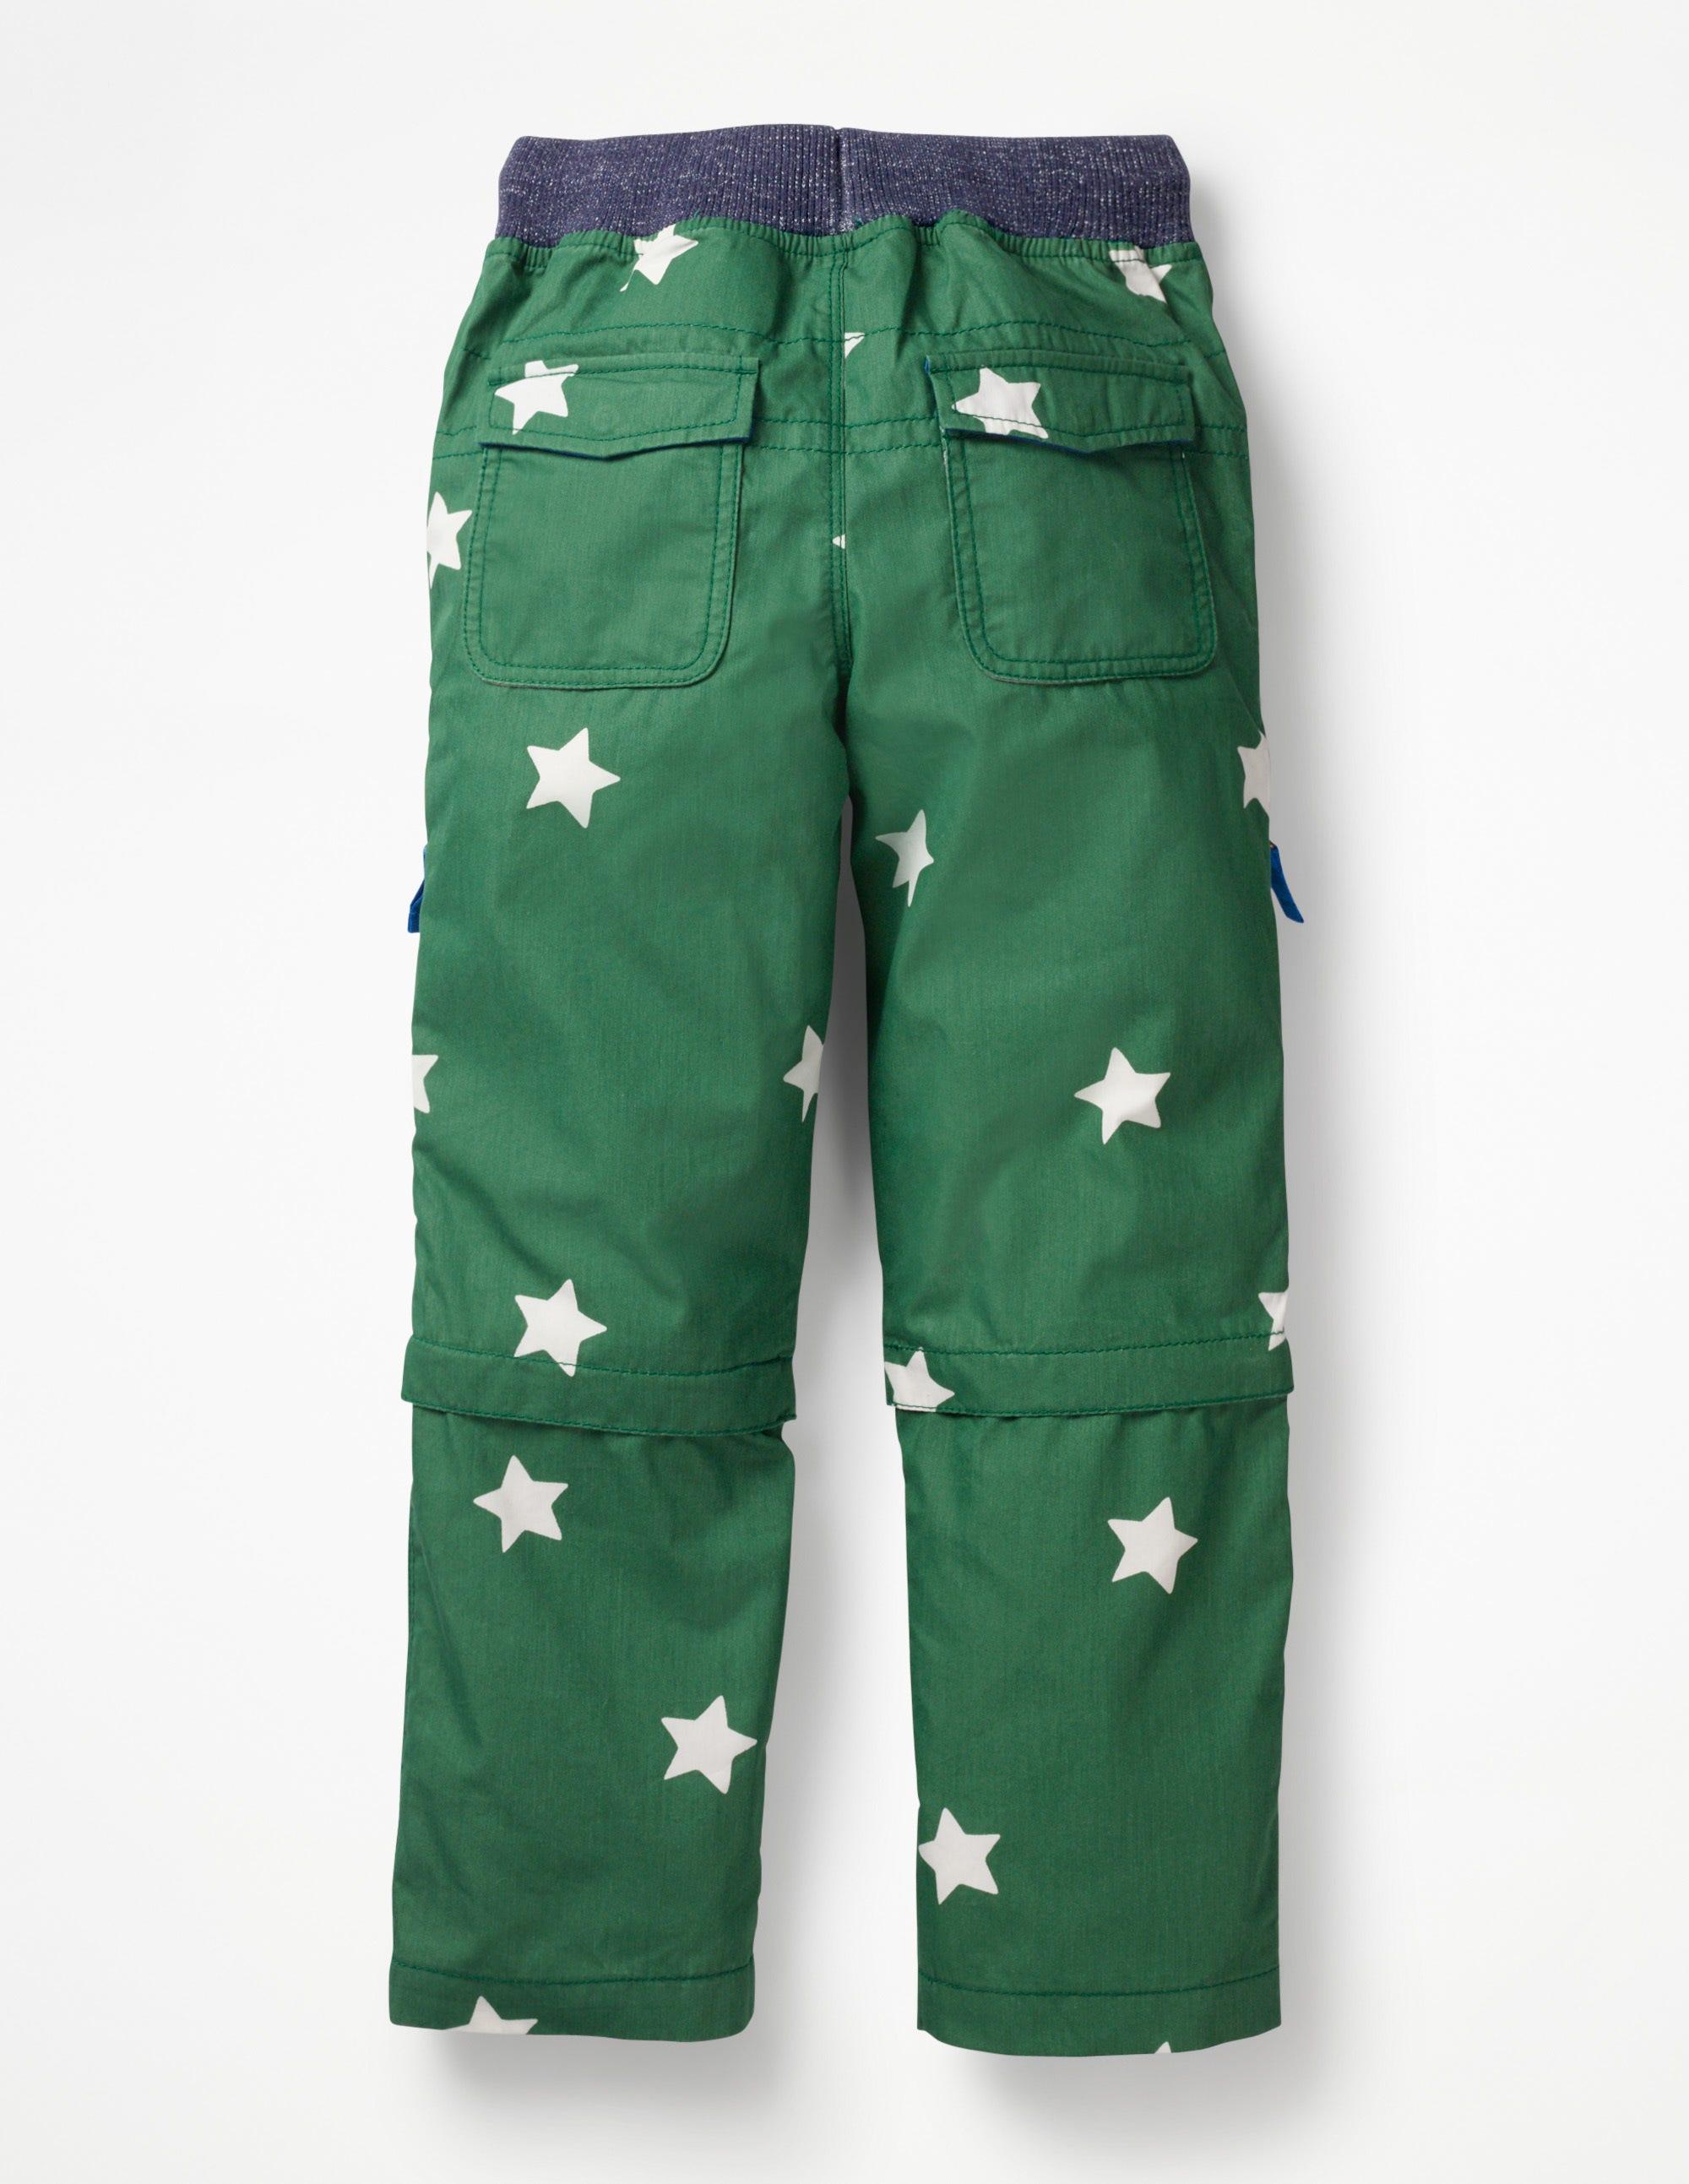 ZIPPY Boys Trouser